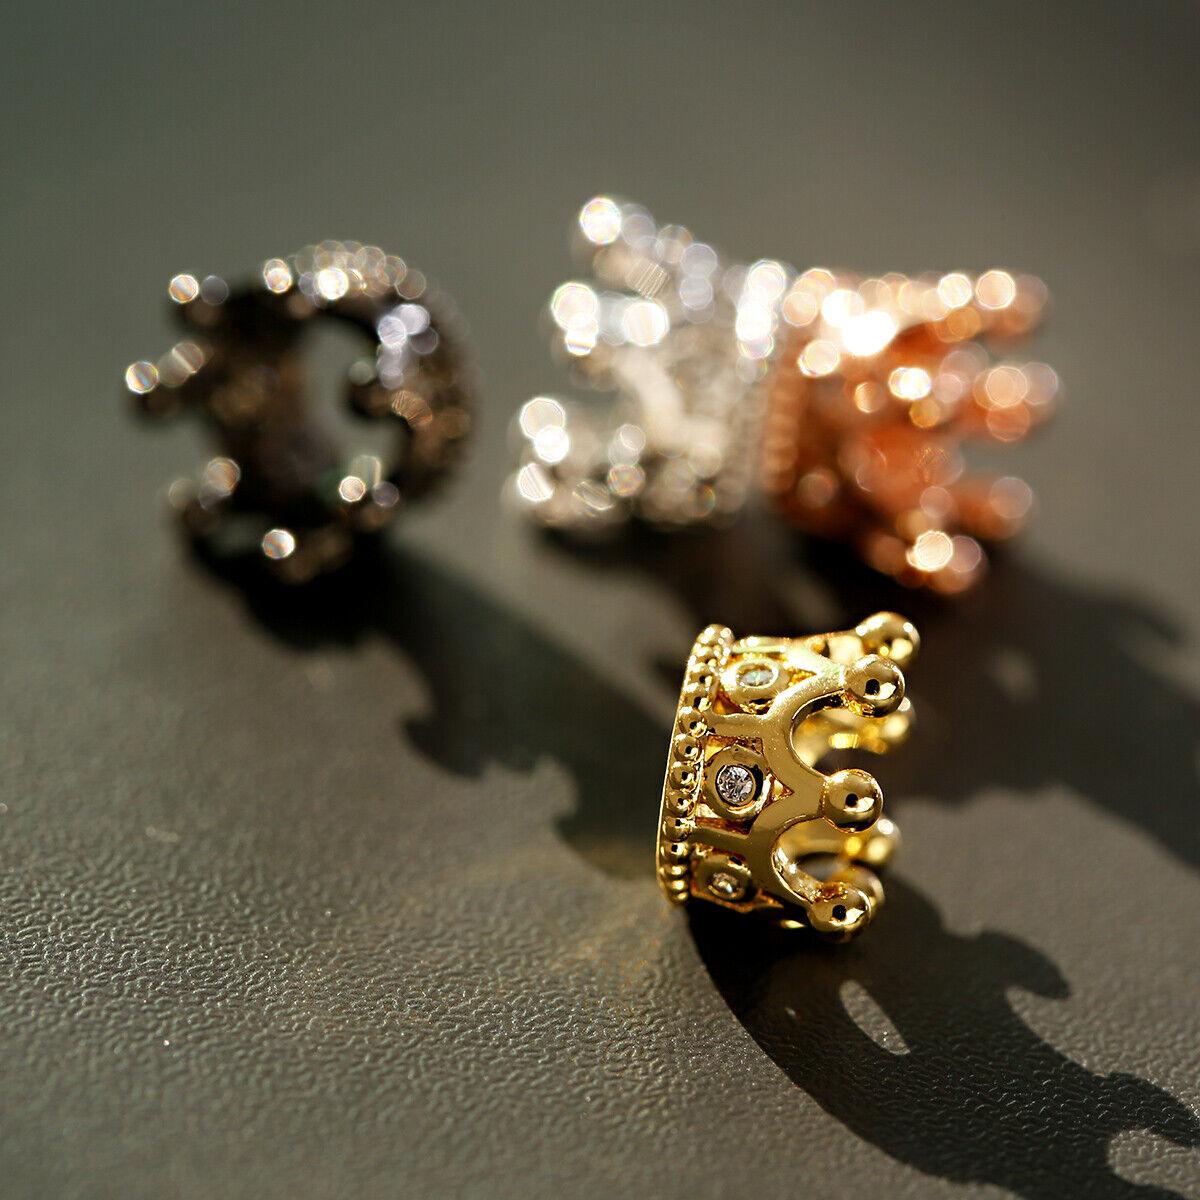 Zircon Gemstones Pave Queen Crown Bracelet Brass Copper Connector Charm Beads 12